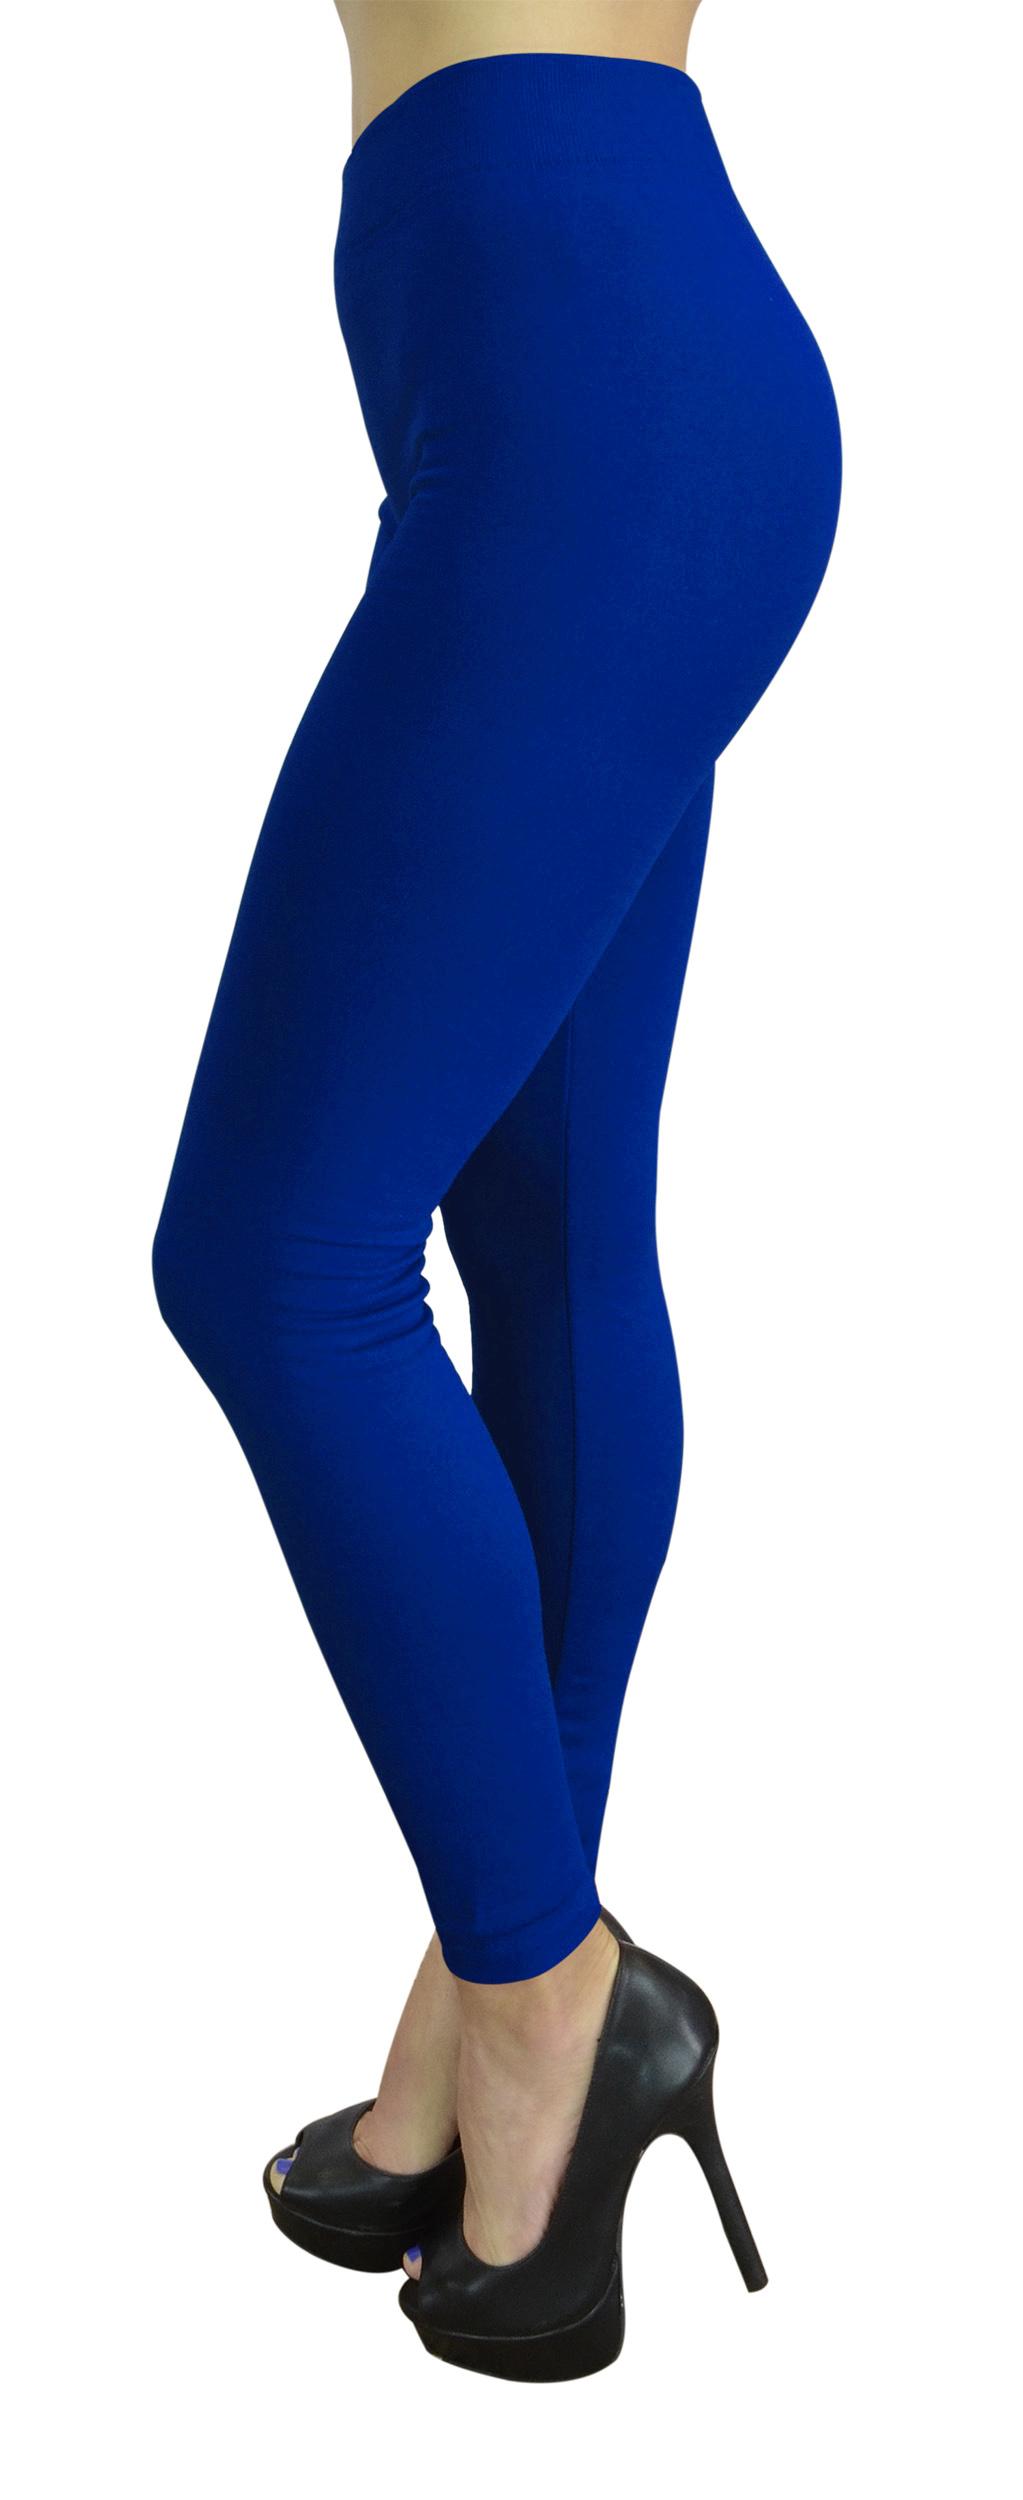 Belle Donne Womens Leggings Workout Yoga Solid Color High Waist Dark Blue